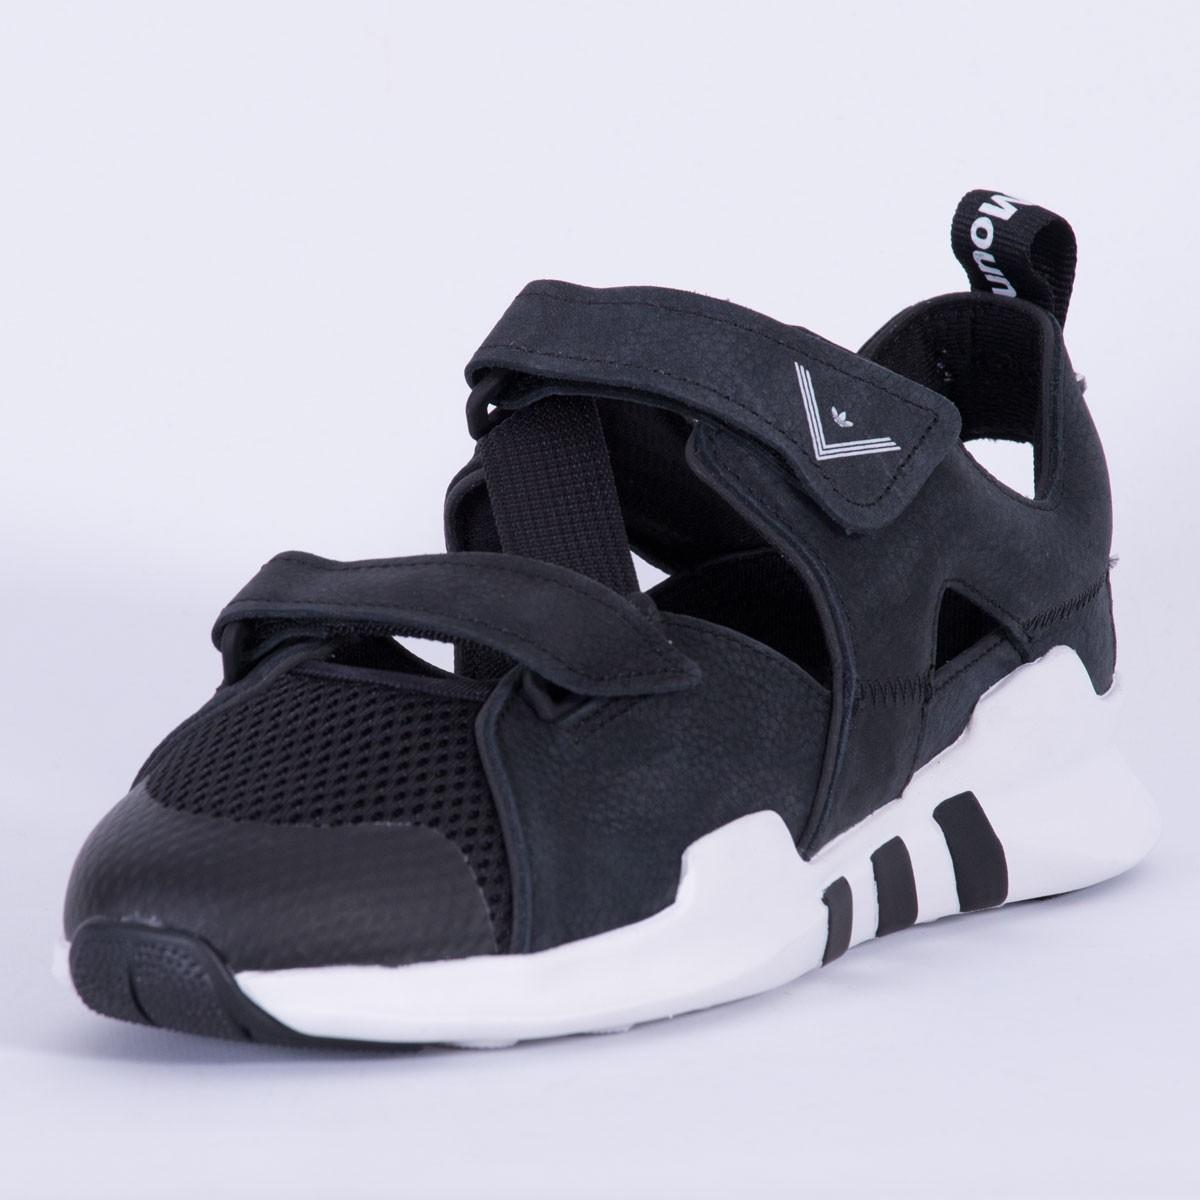 36d20f114775 adidas Originals x White Mountaineering WM ADV Sandal Core Black Ftwr White